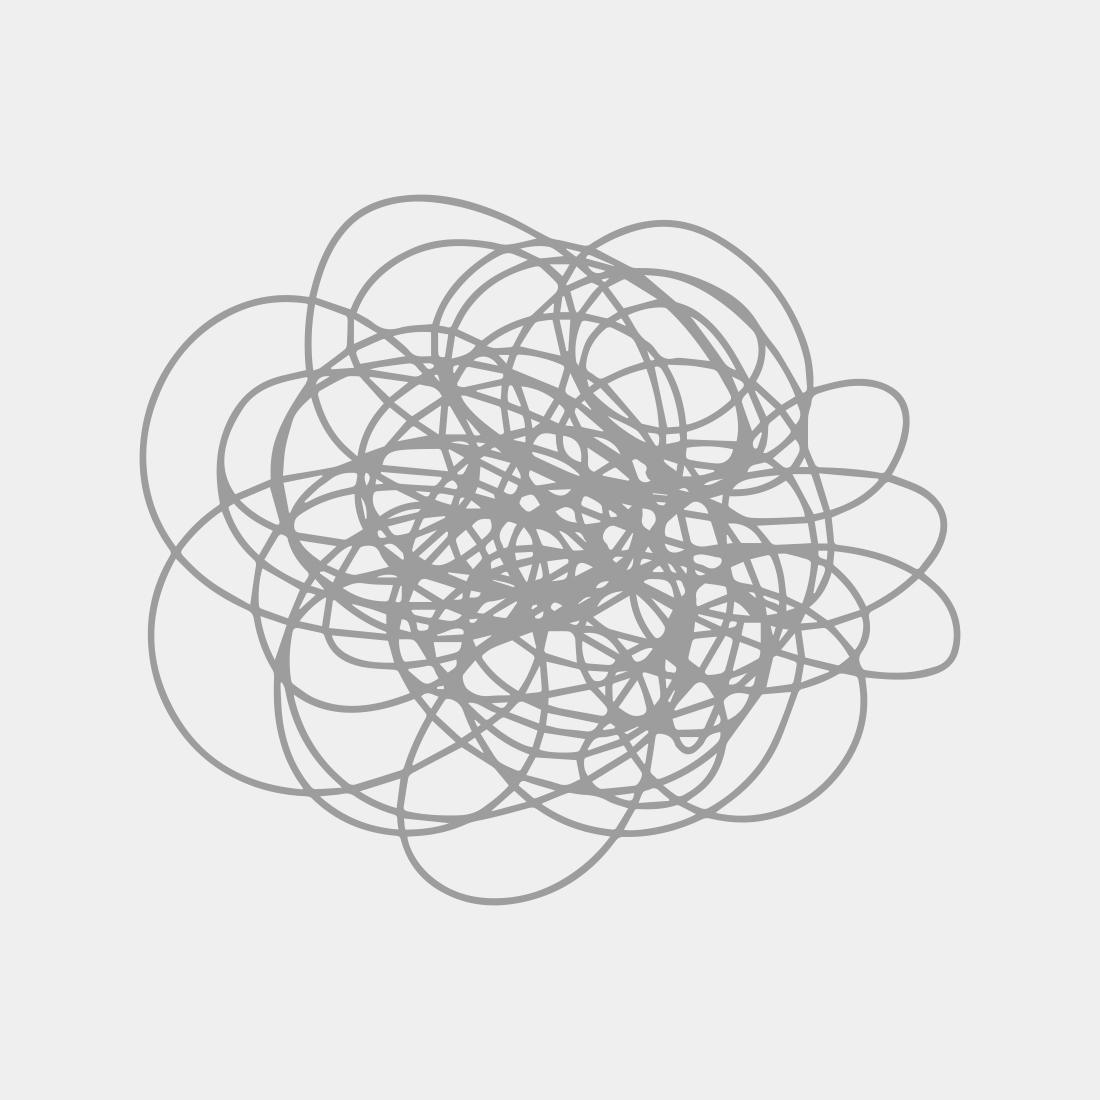 Barbara Rae: Prints Limited Edition